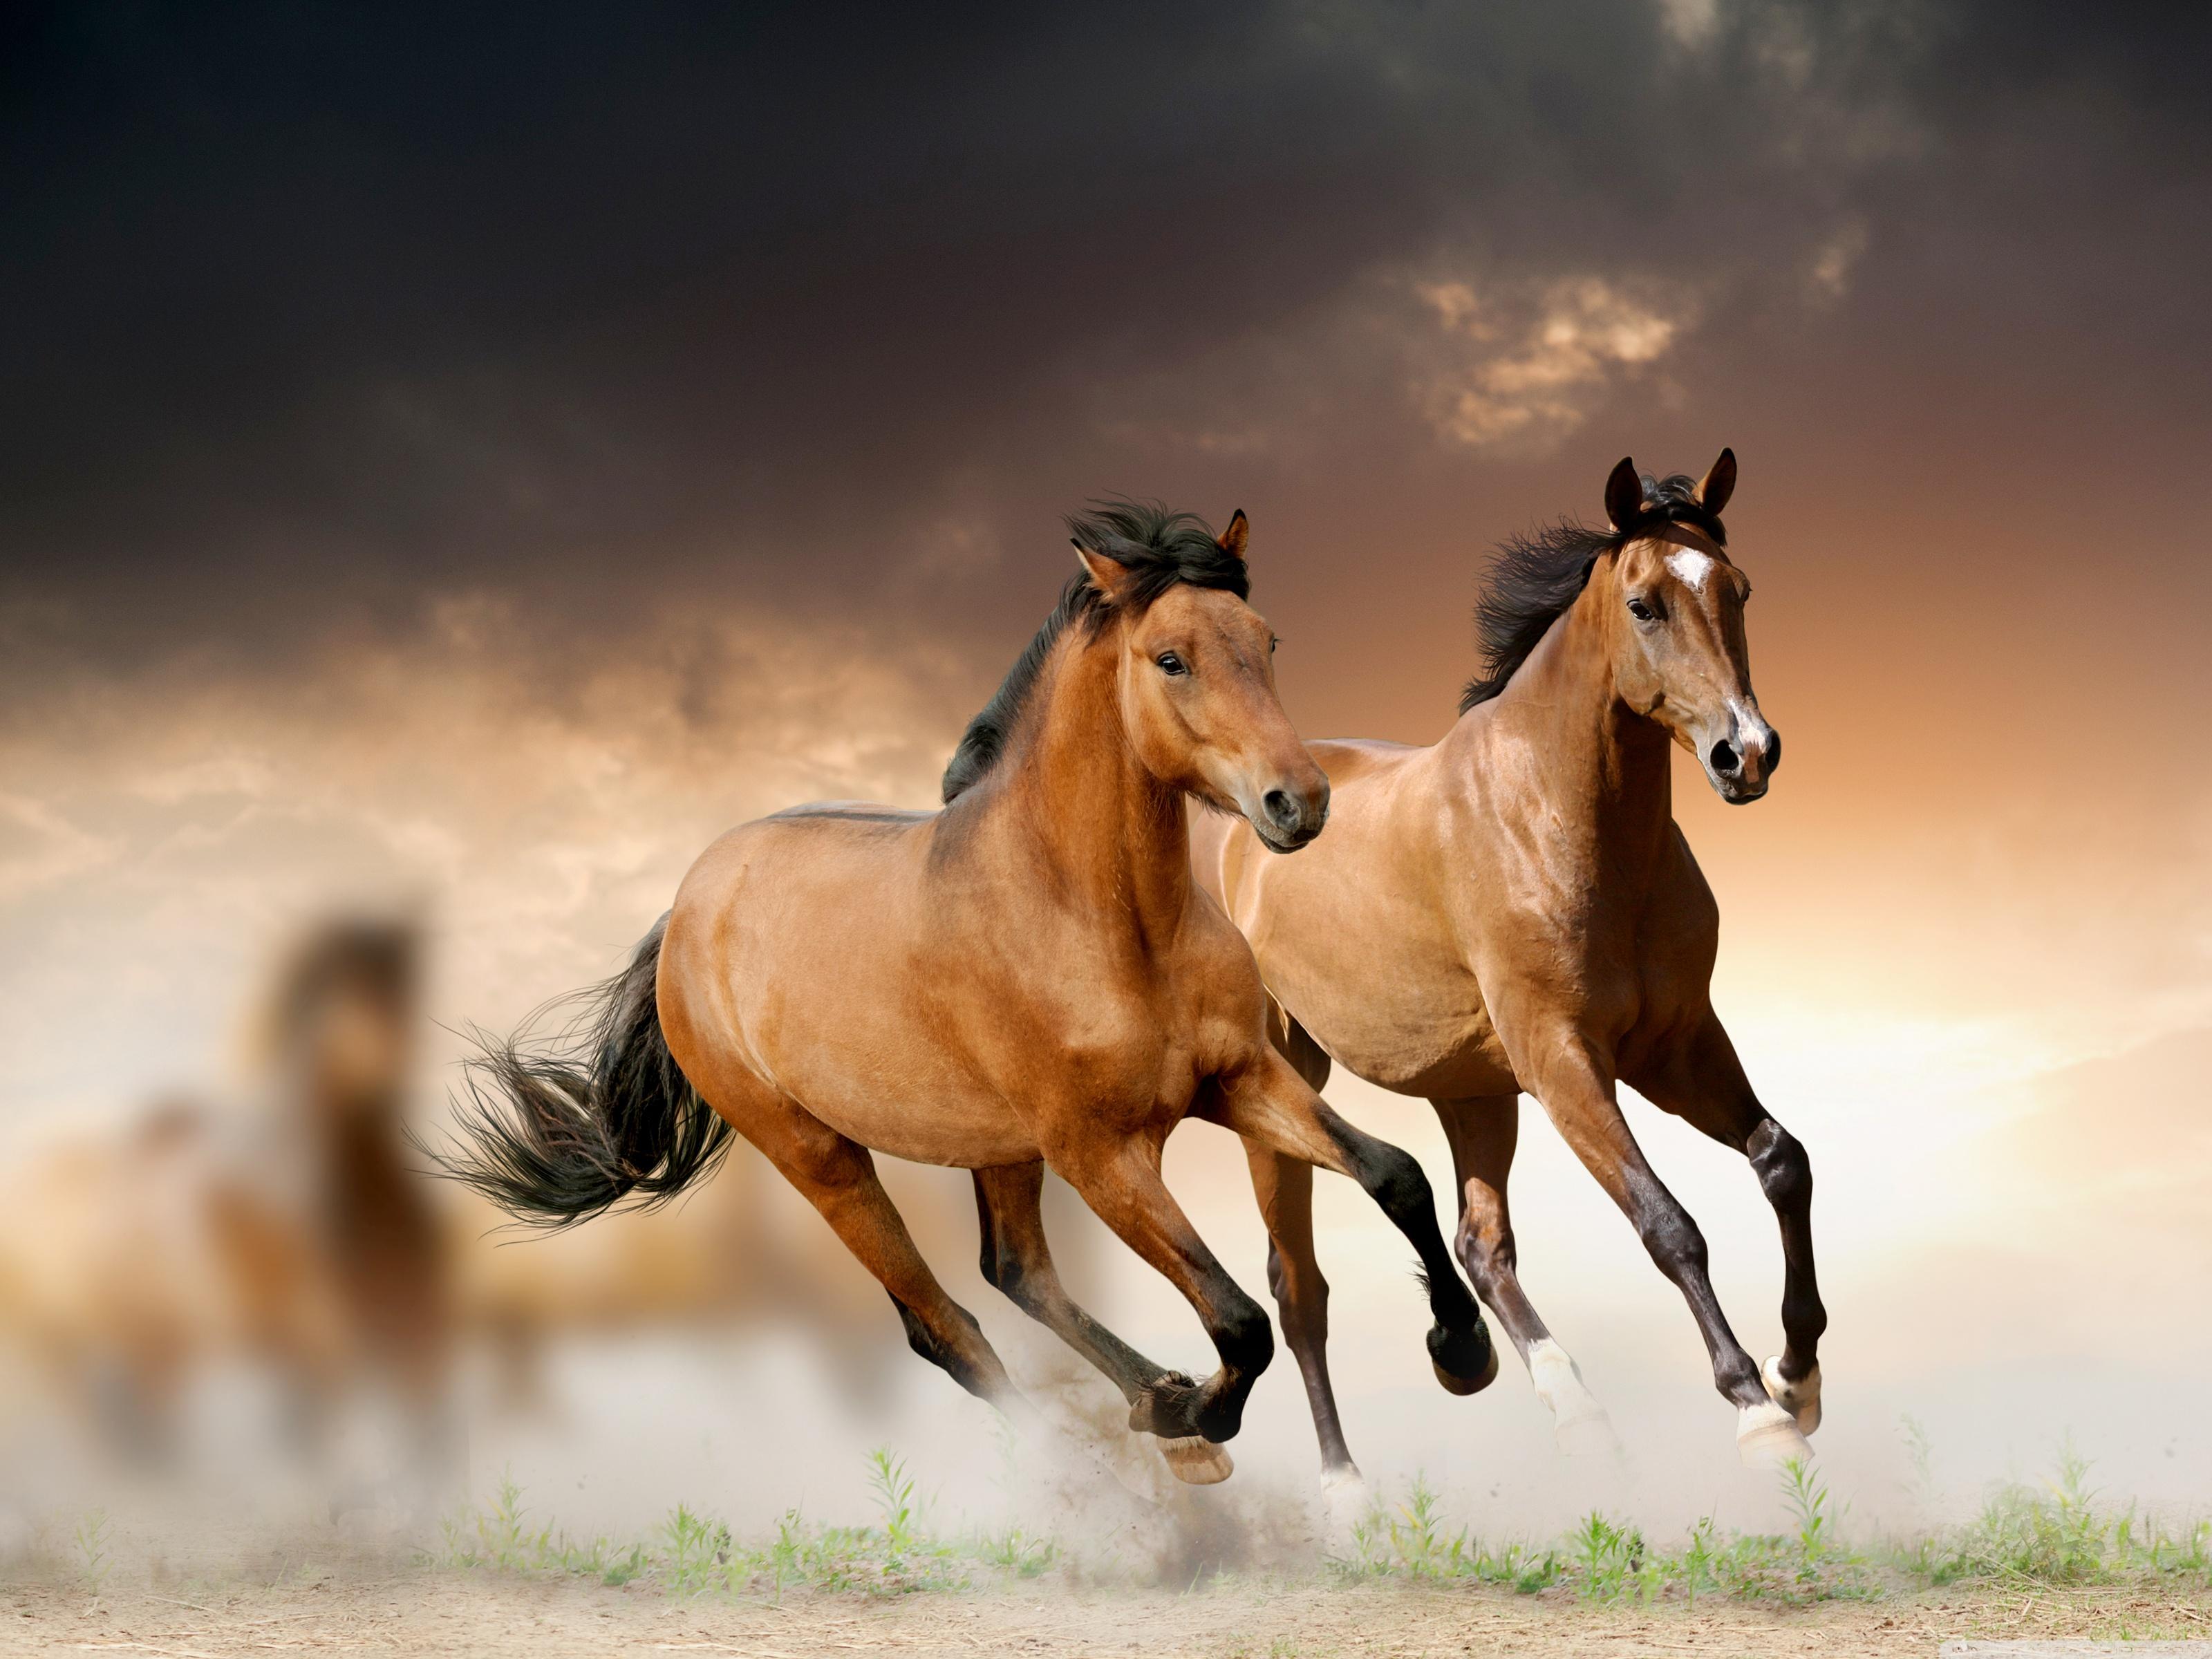 Horses Running 4K HD Desktop Wallpaper for 4K Ultra HD TV 3200x2400